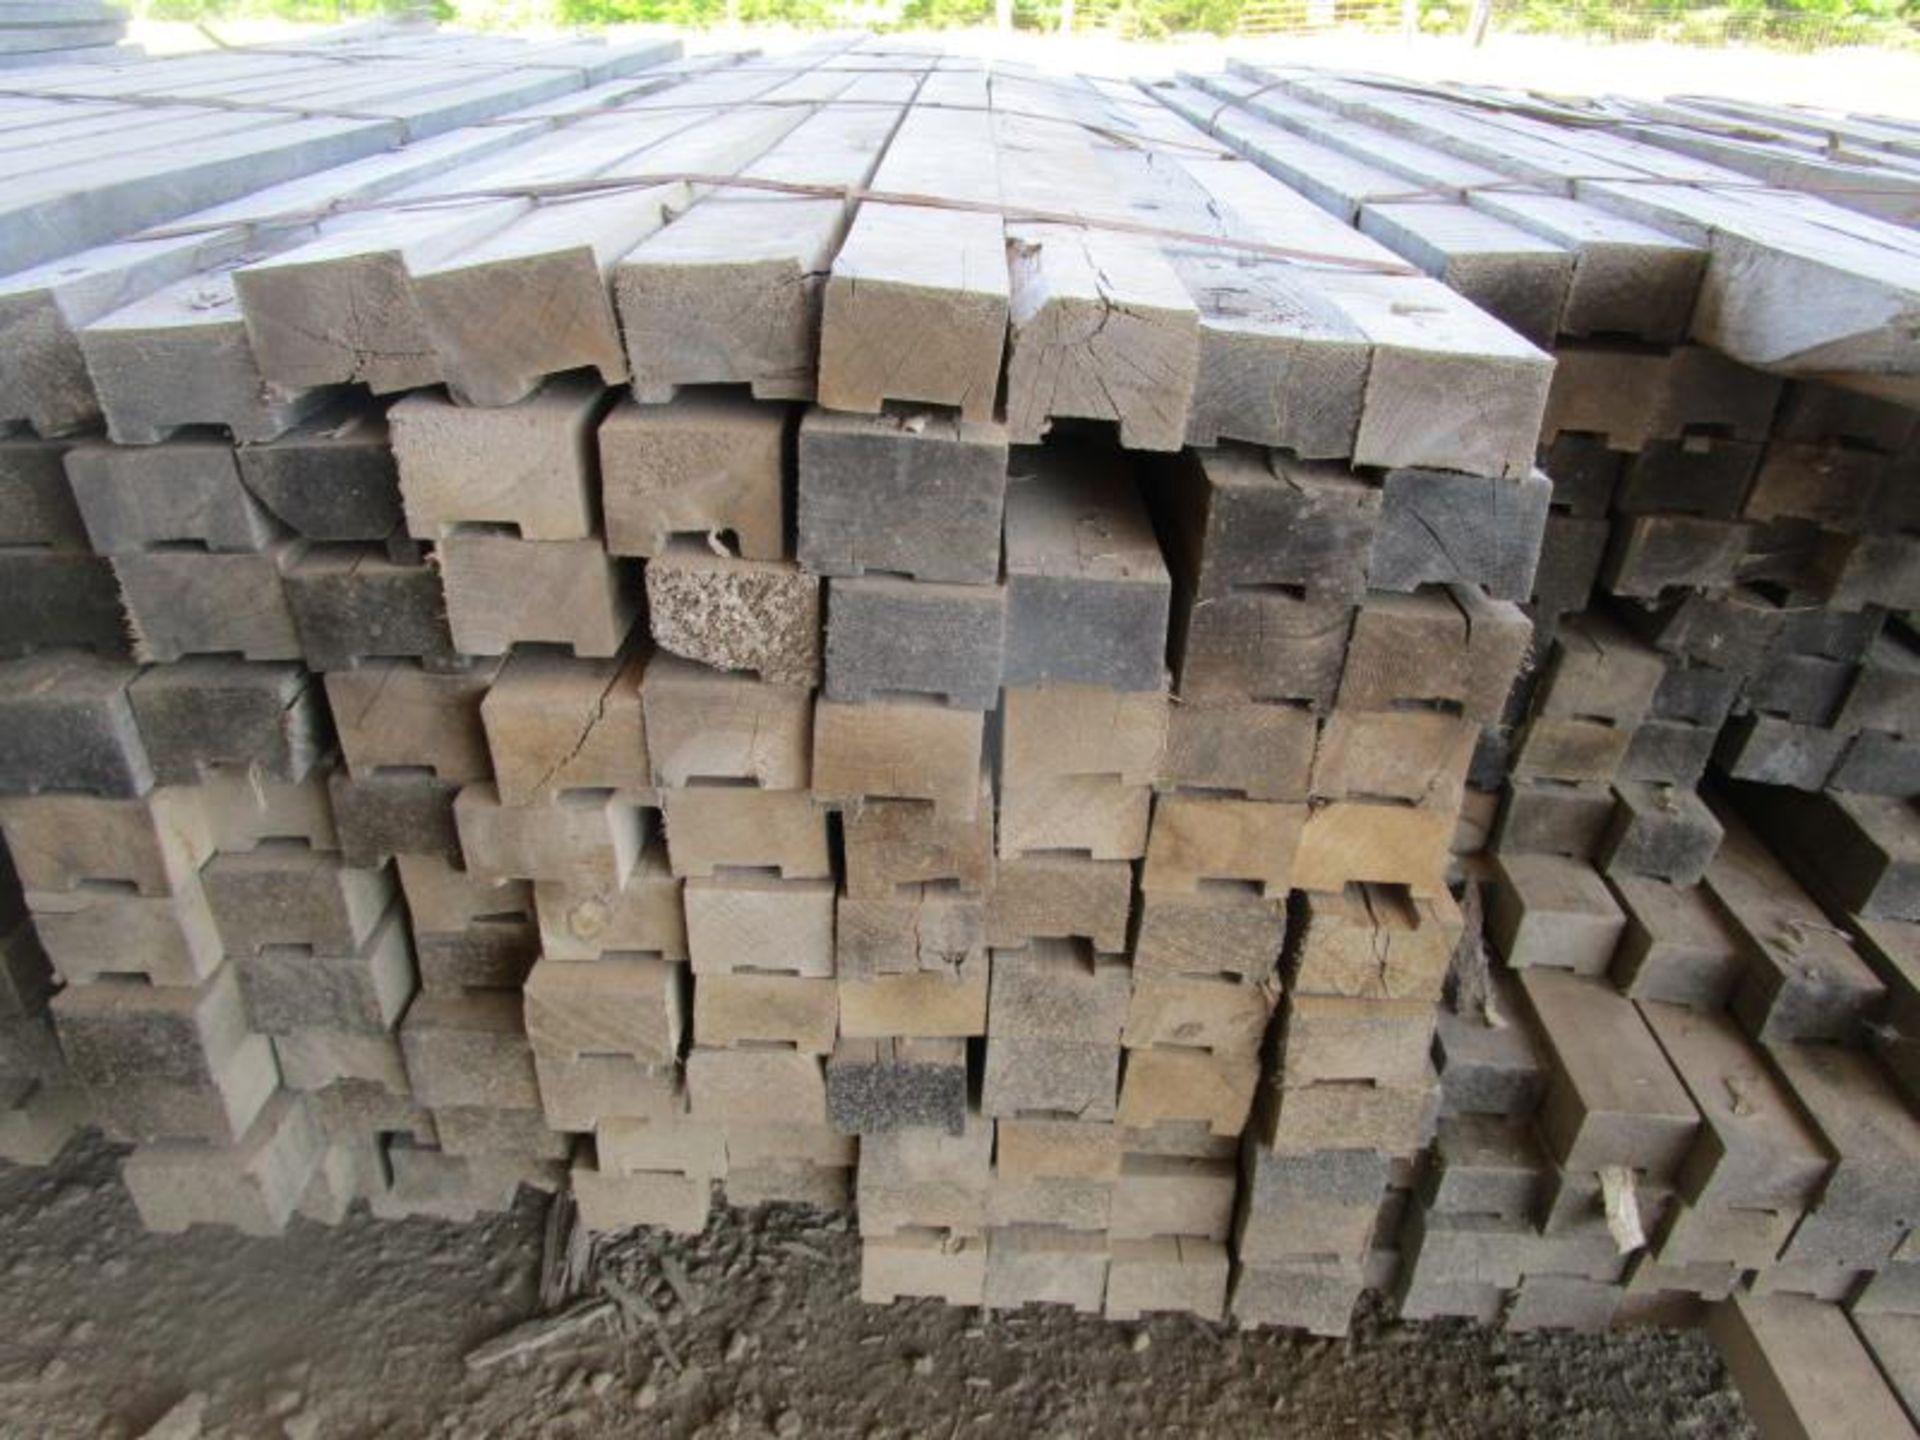 Lot 1 - Bundles of 2x4 x6 (3) Pallets